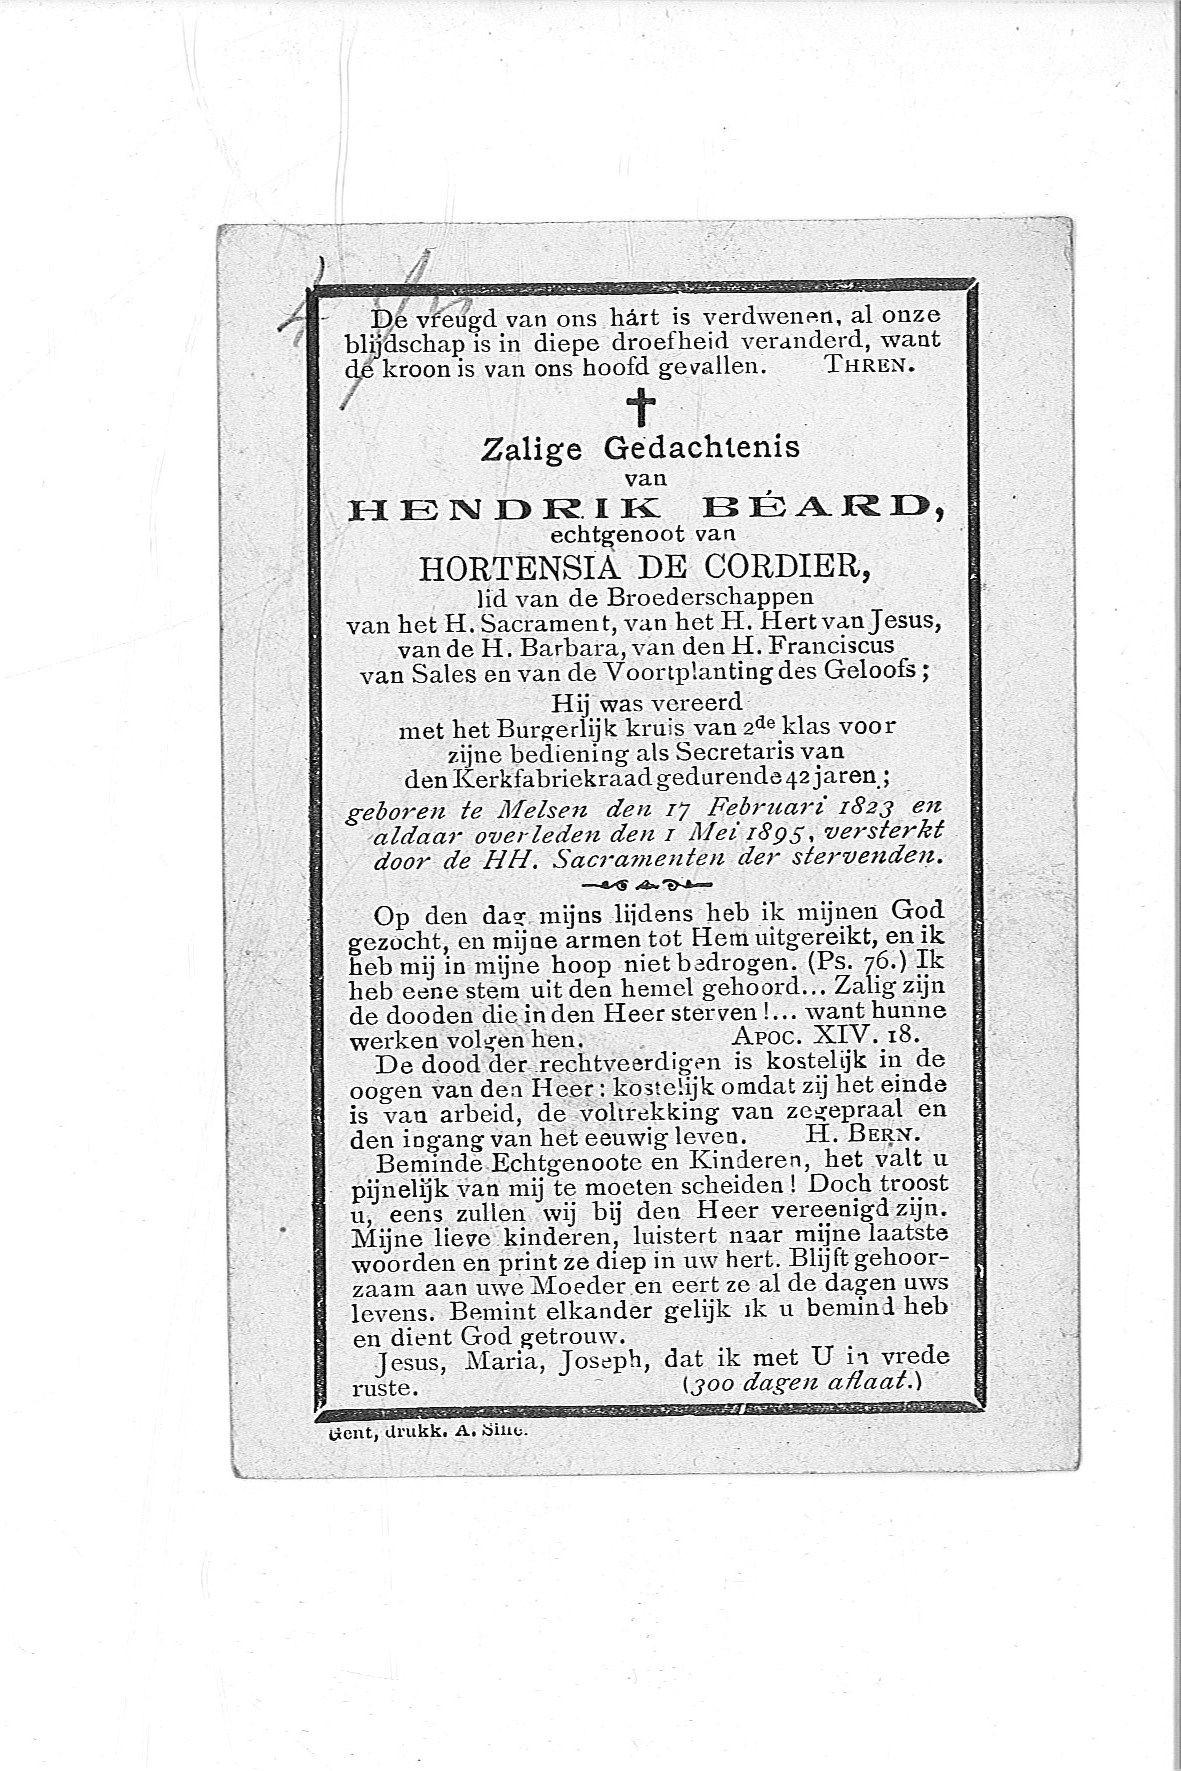 hendrik(1896)20090804095126_00033.jpg